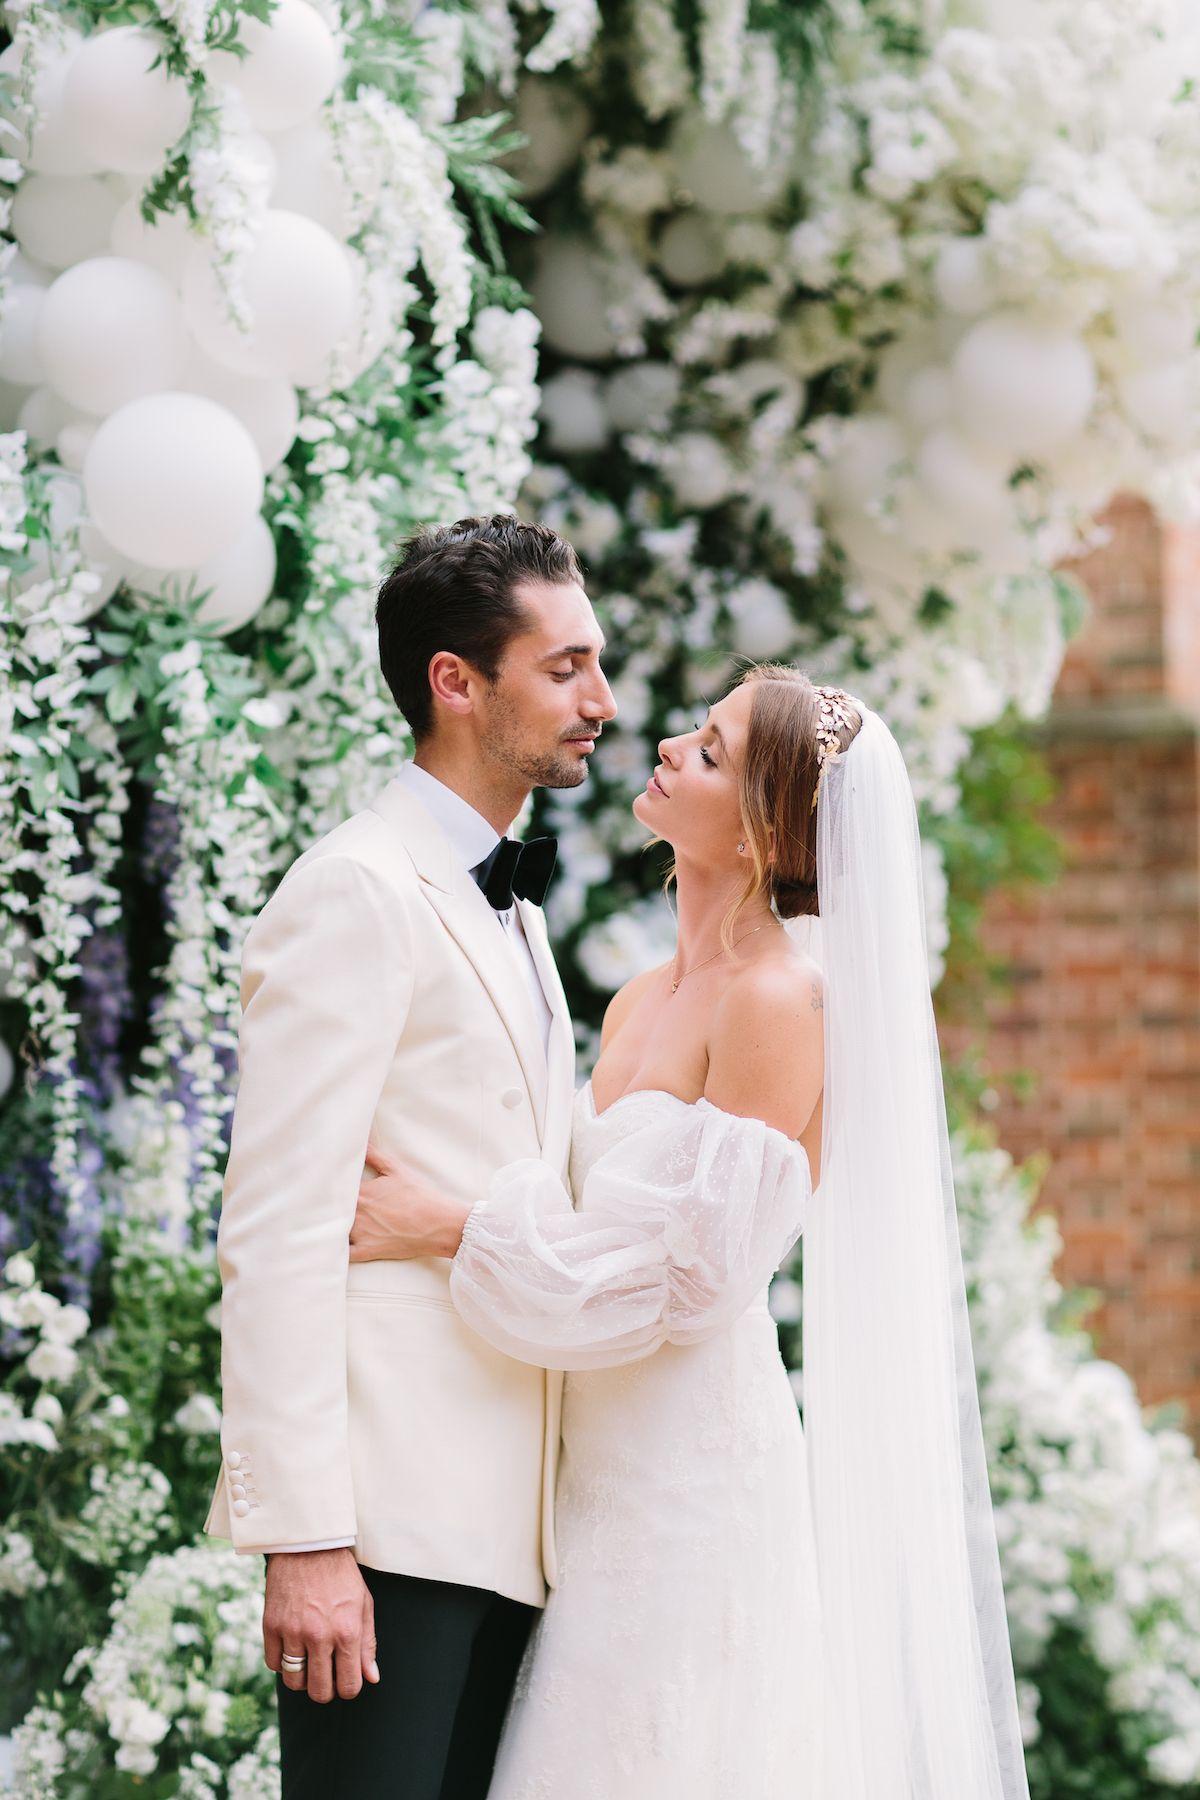 Photo of Millie Mackintosh weds in Halfpenny London — Halfpenny London